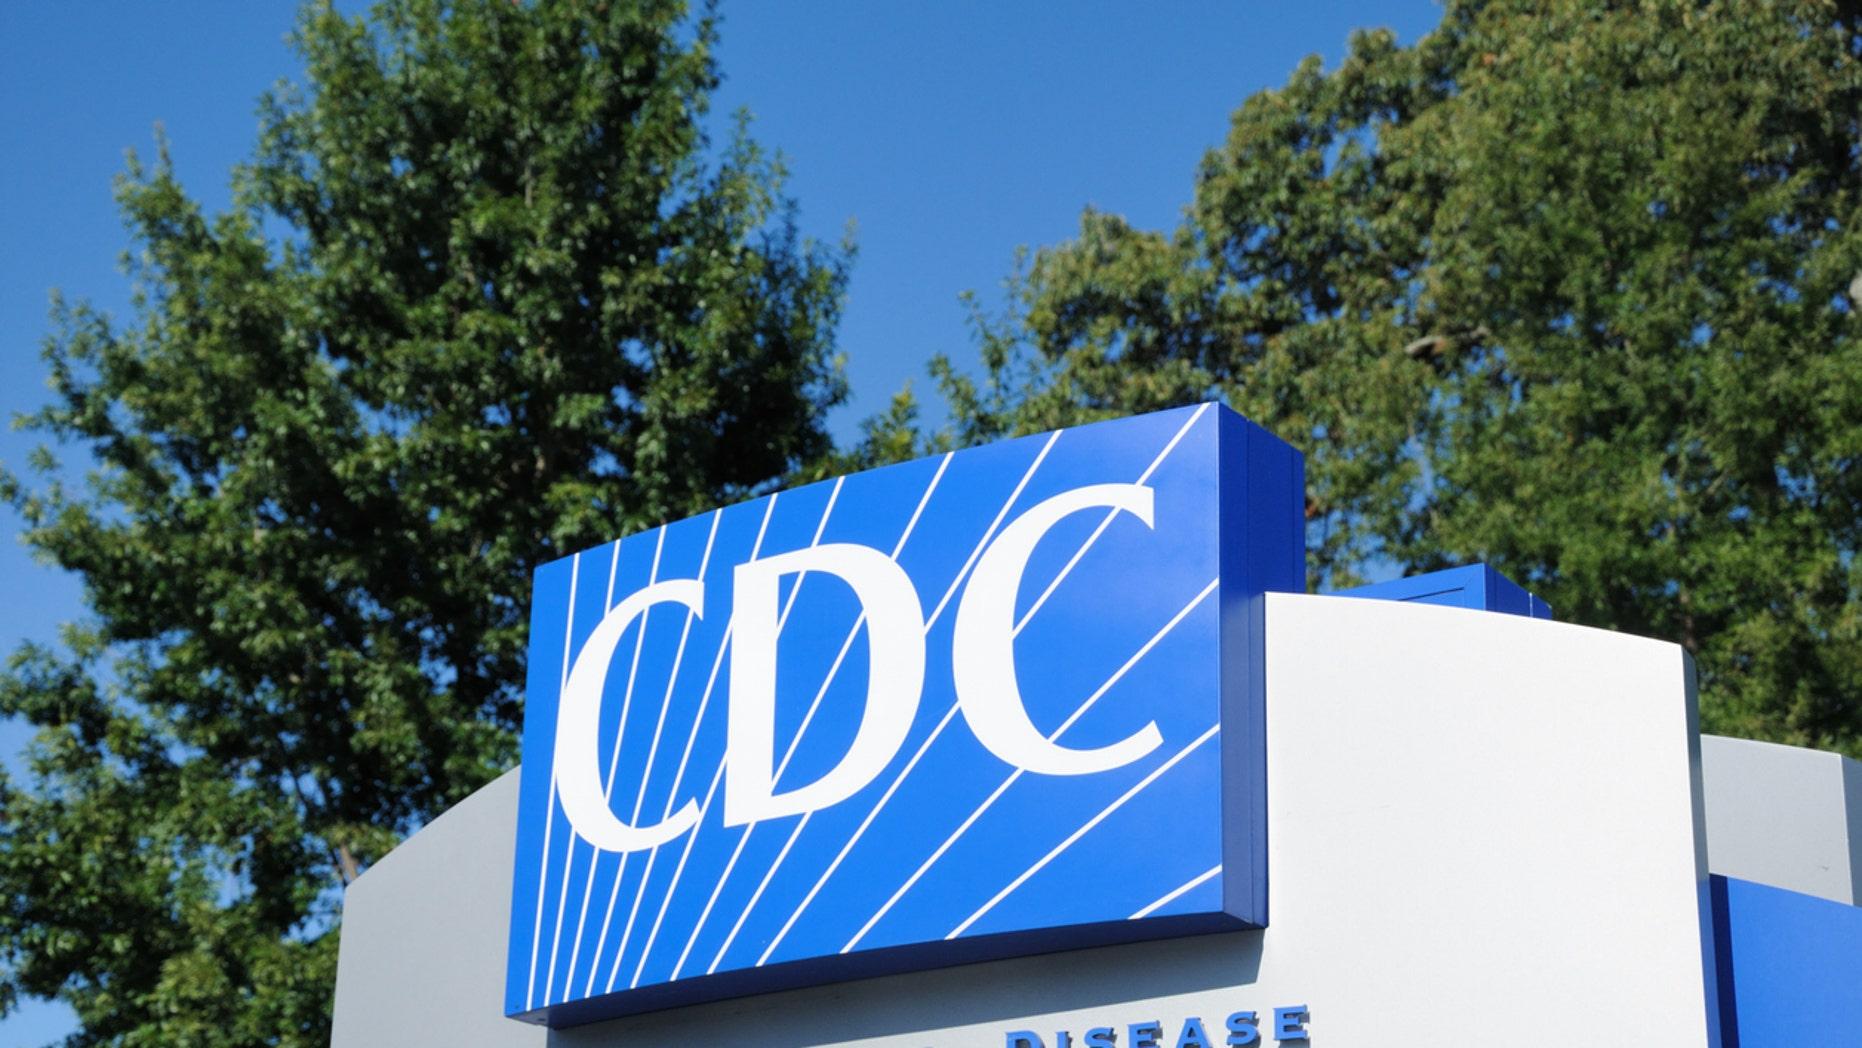 FOX NEWS – CDC deletes coronavirus airborne transmission guidance, says update was 'draft version'